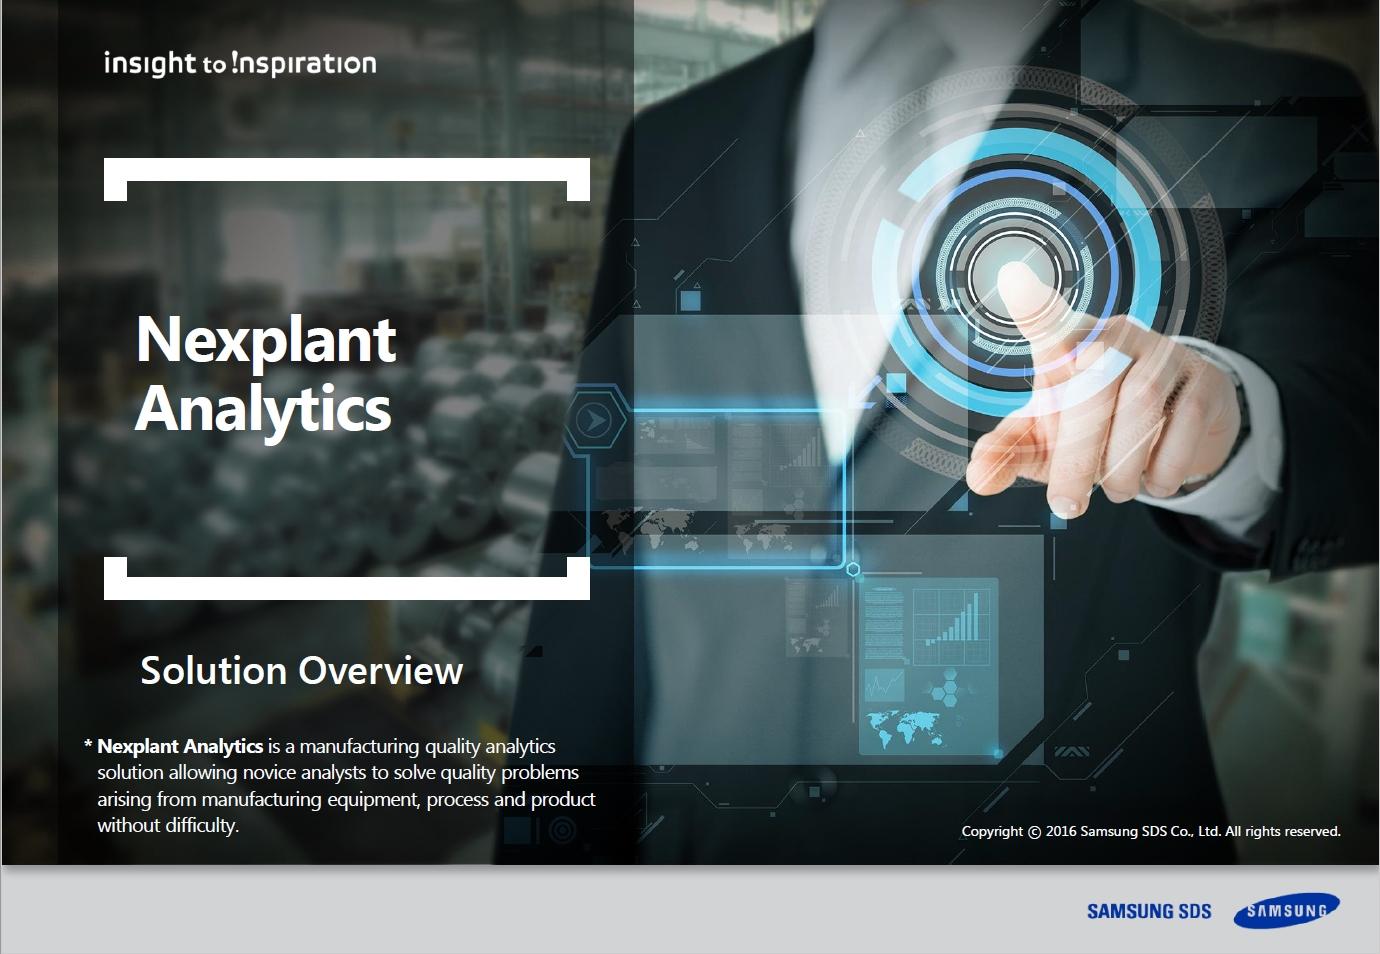 [Nexplant Analytics] Enhance manufacturing with unmanned big data analytics